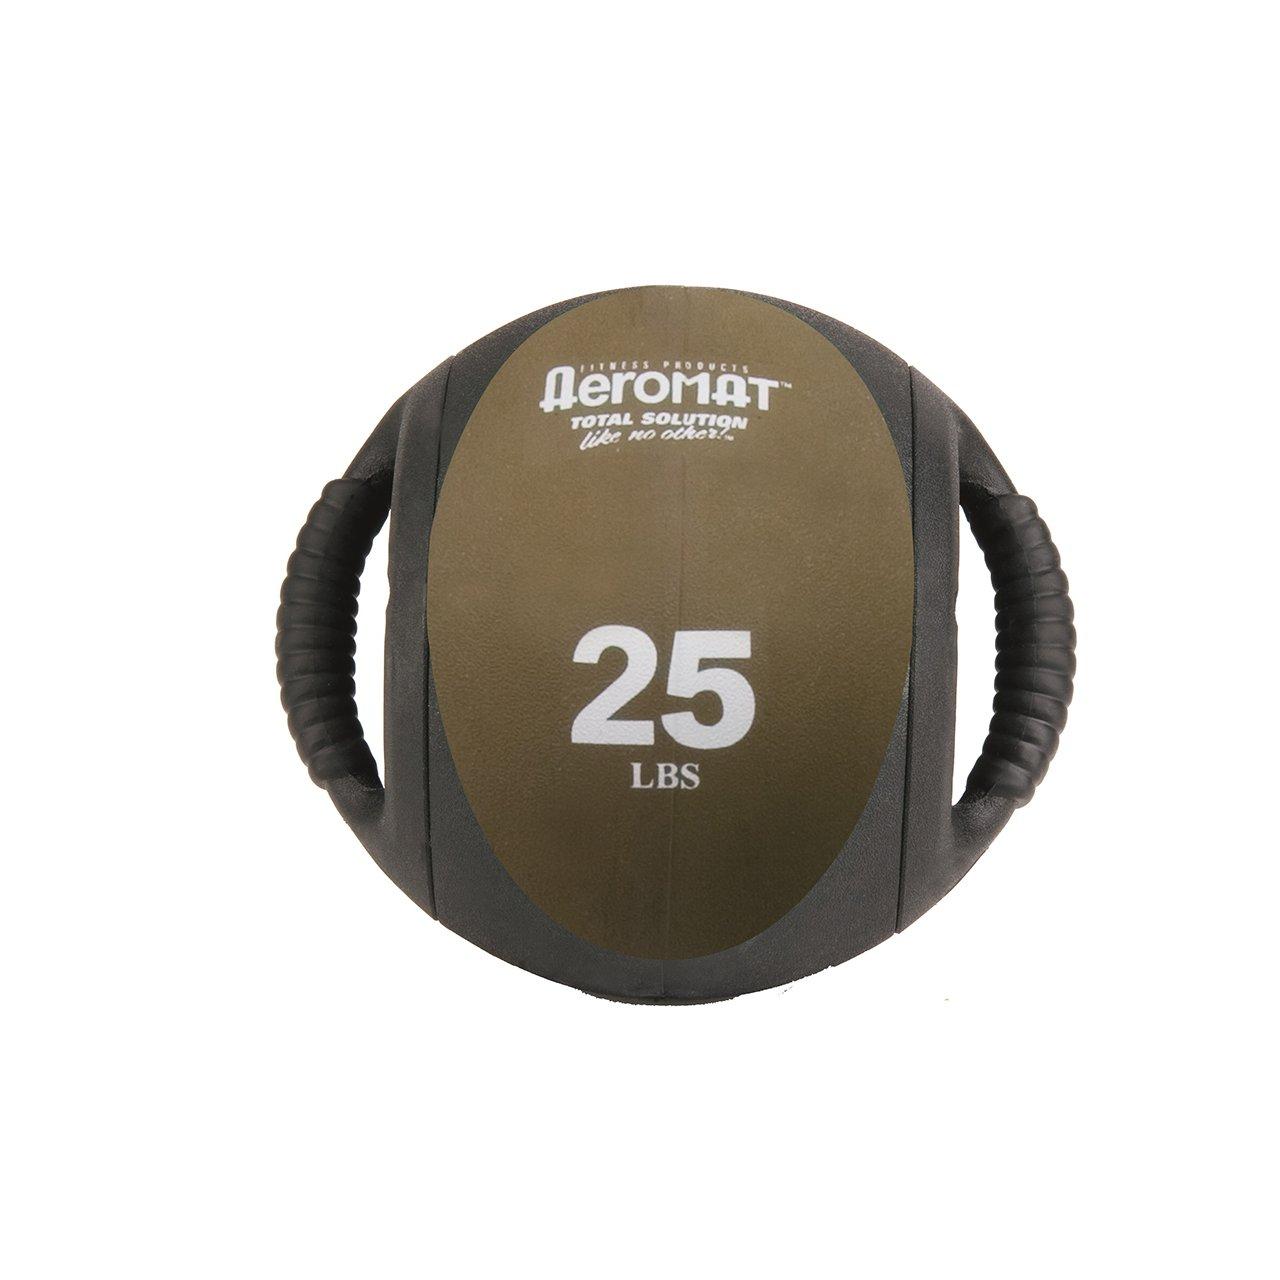 Aeromat Dual Grip Power Medicine Ball, 9cm/25-Pound, Black/Bronze